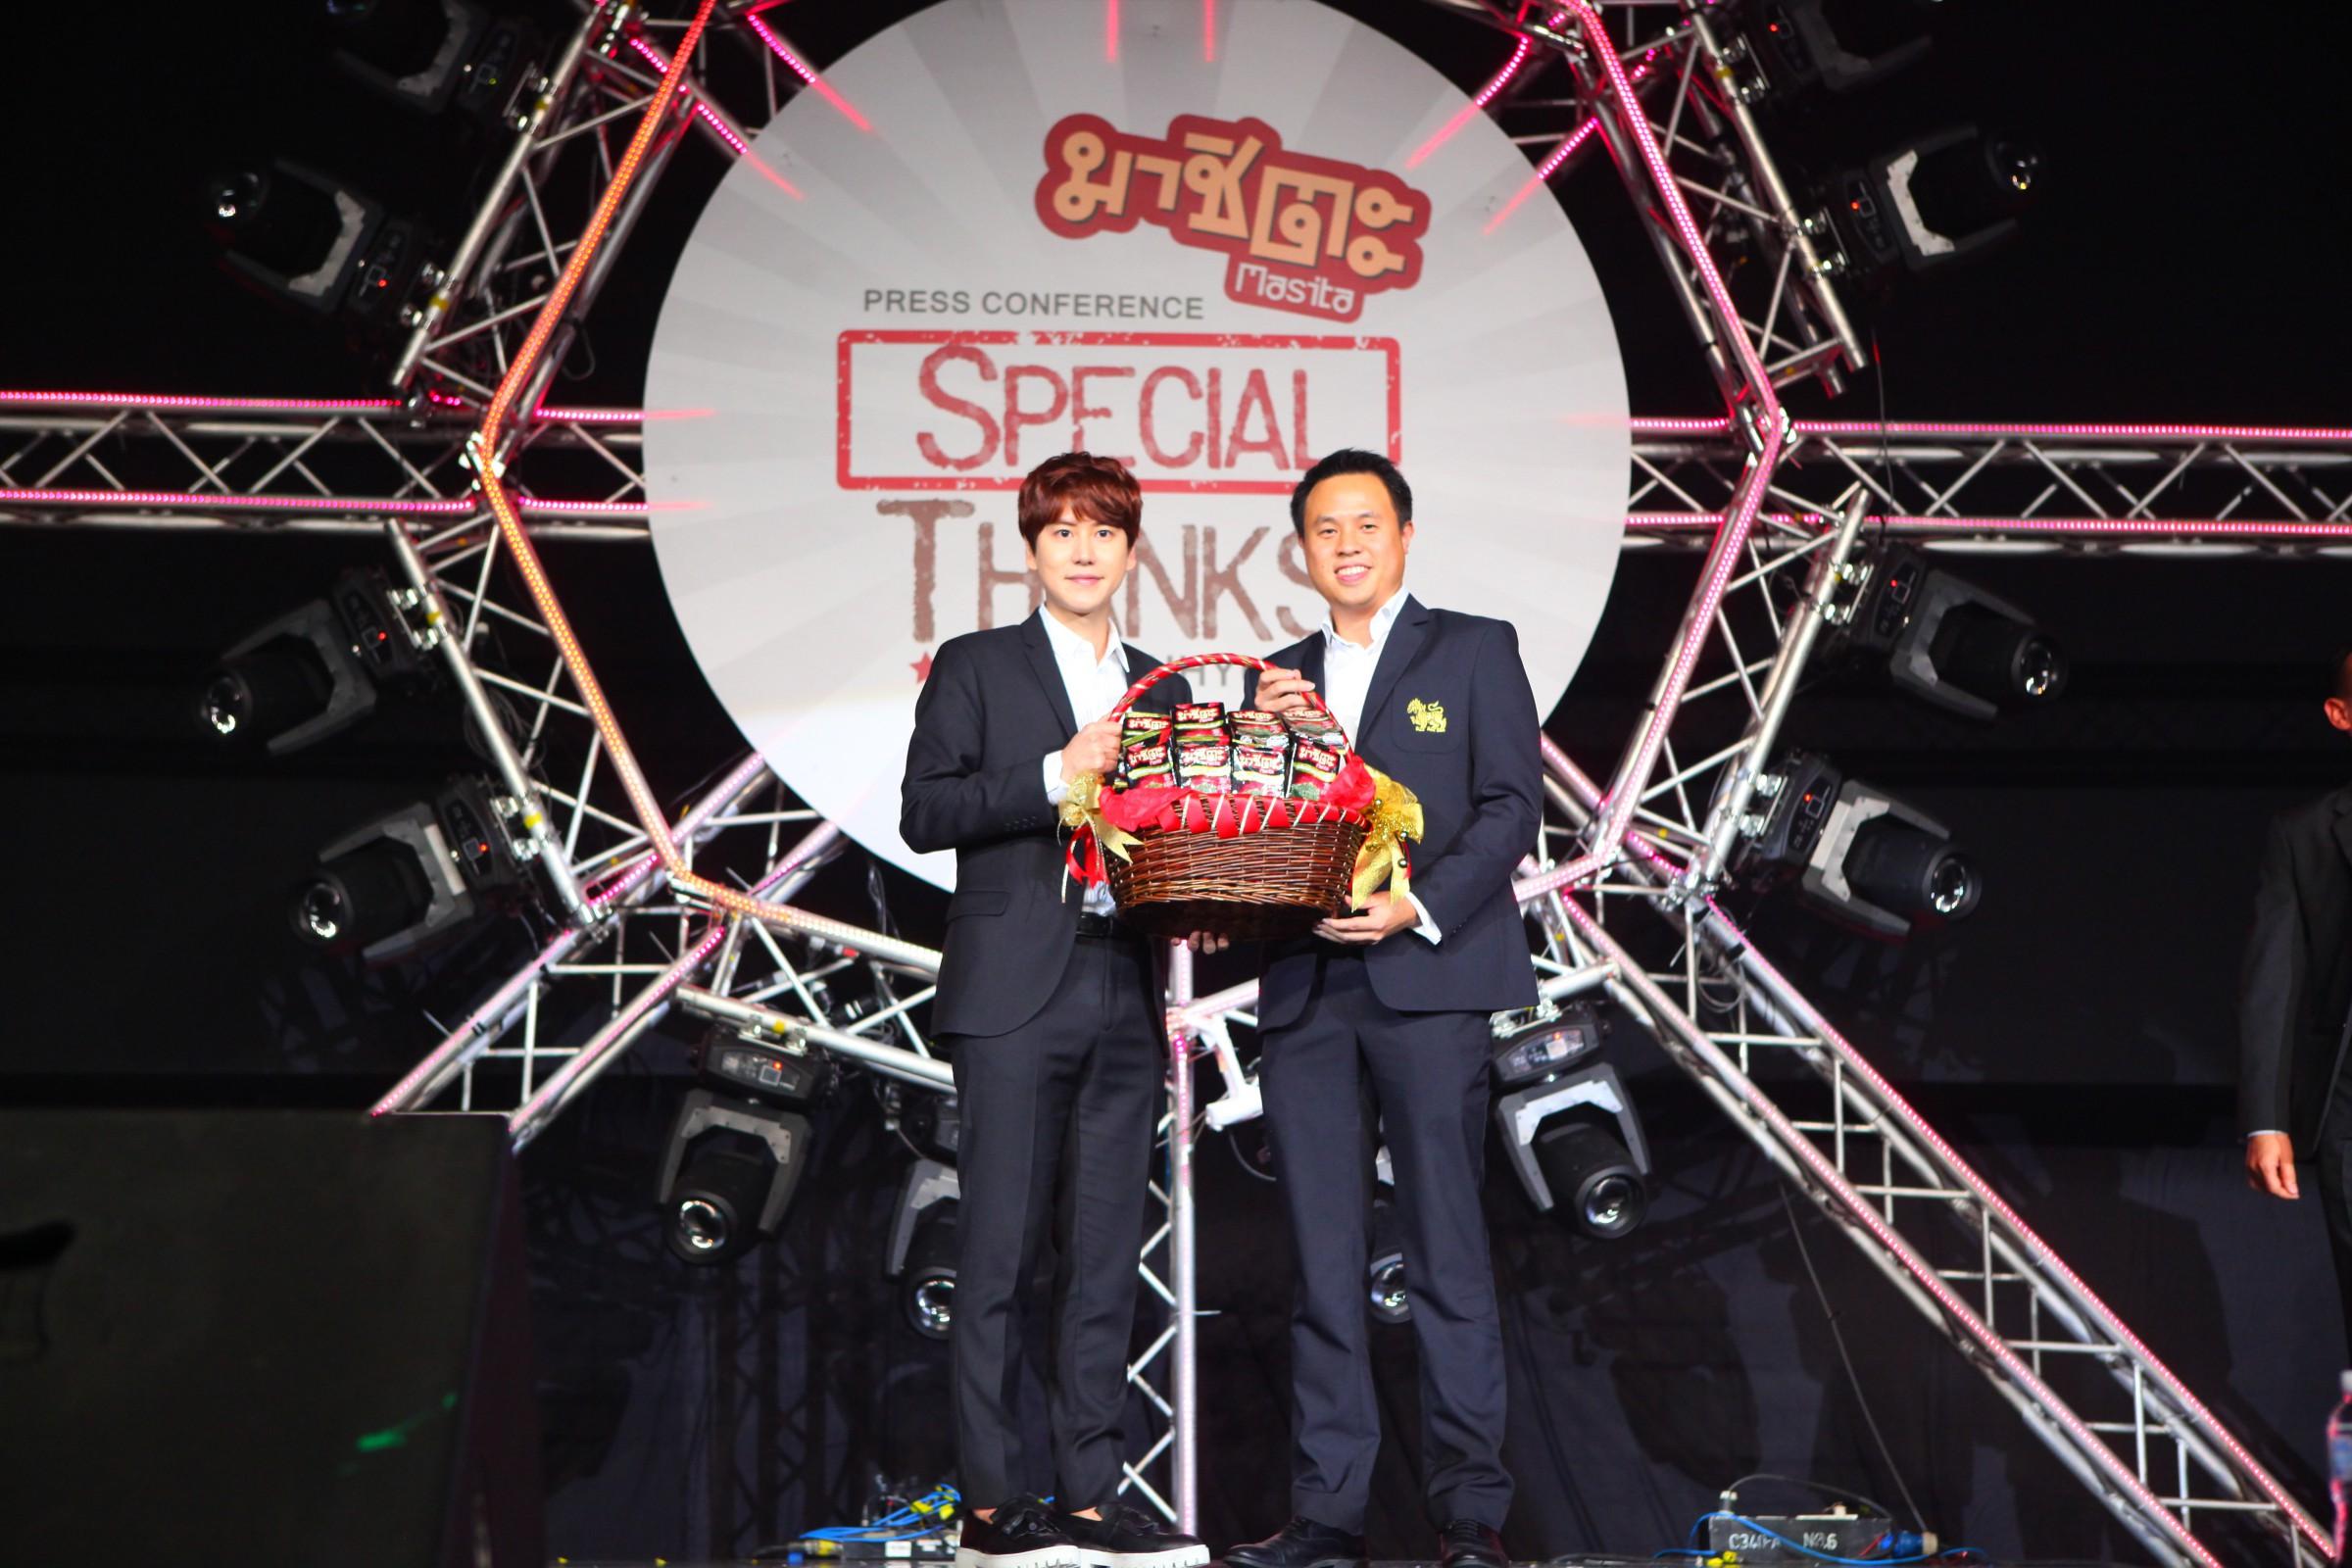 Masita Special Thanks with Kyuhyun_0542